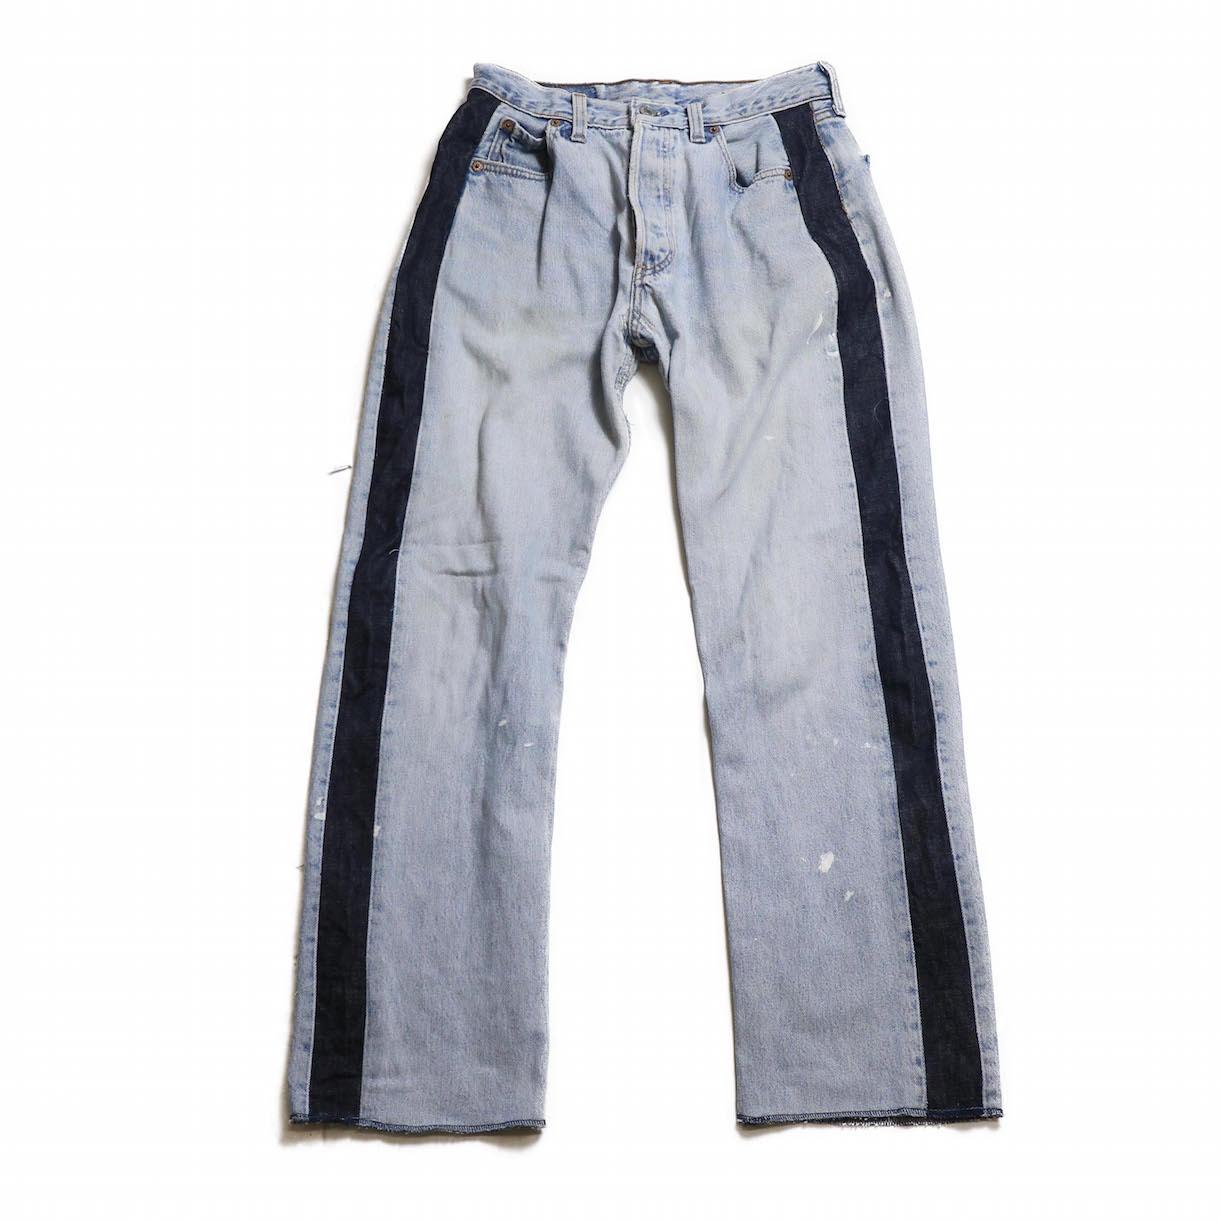 BONUM / SIDE LINE 5P DENIM PANTS(30incA)